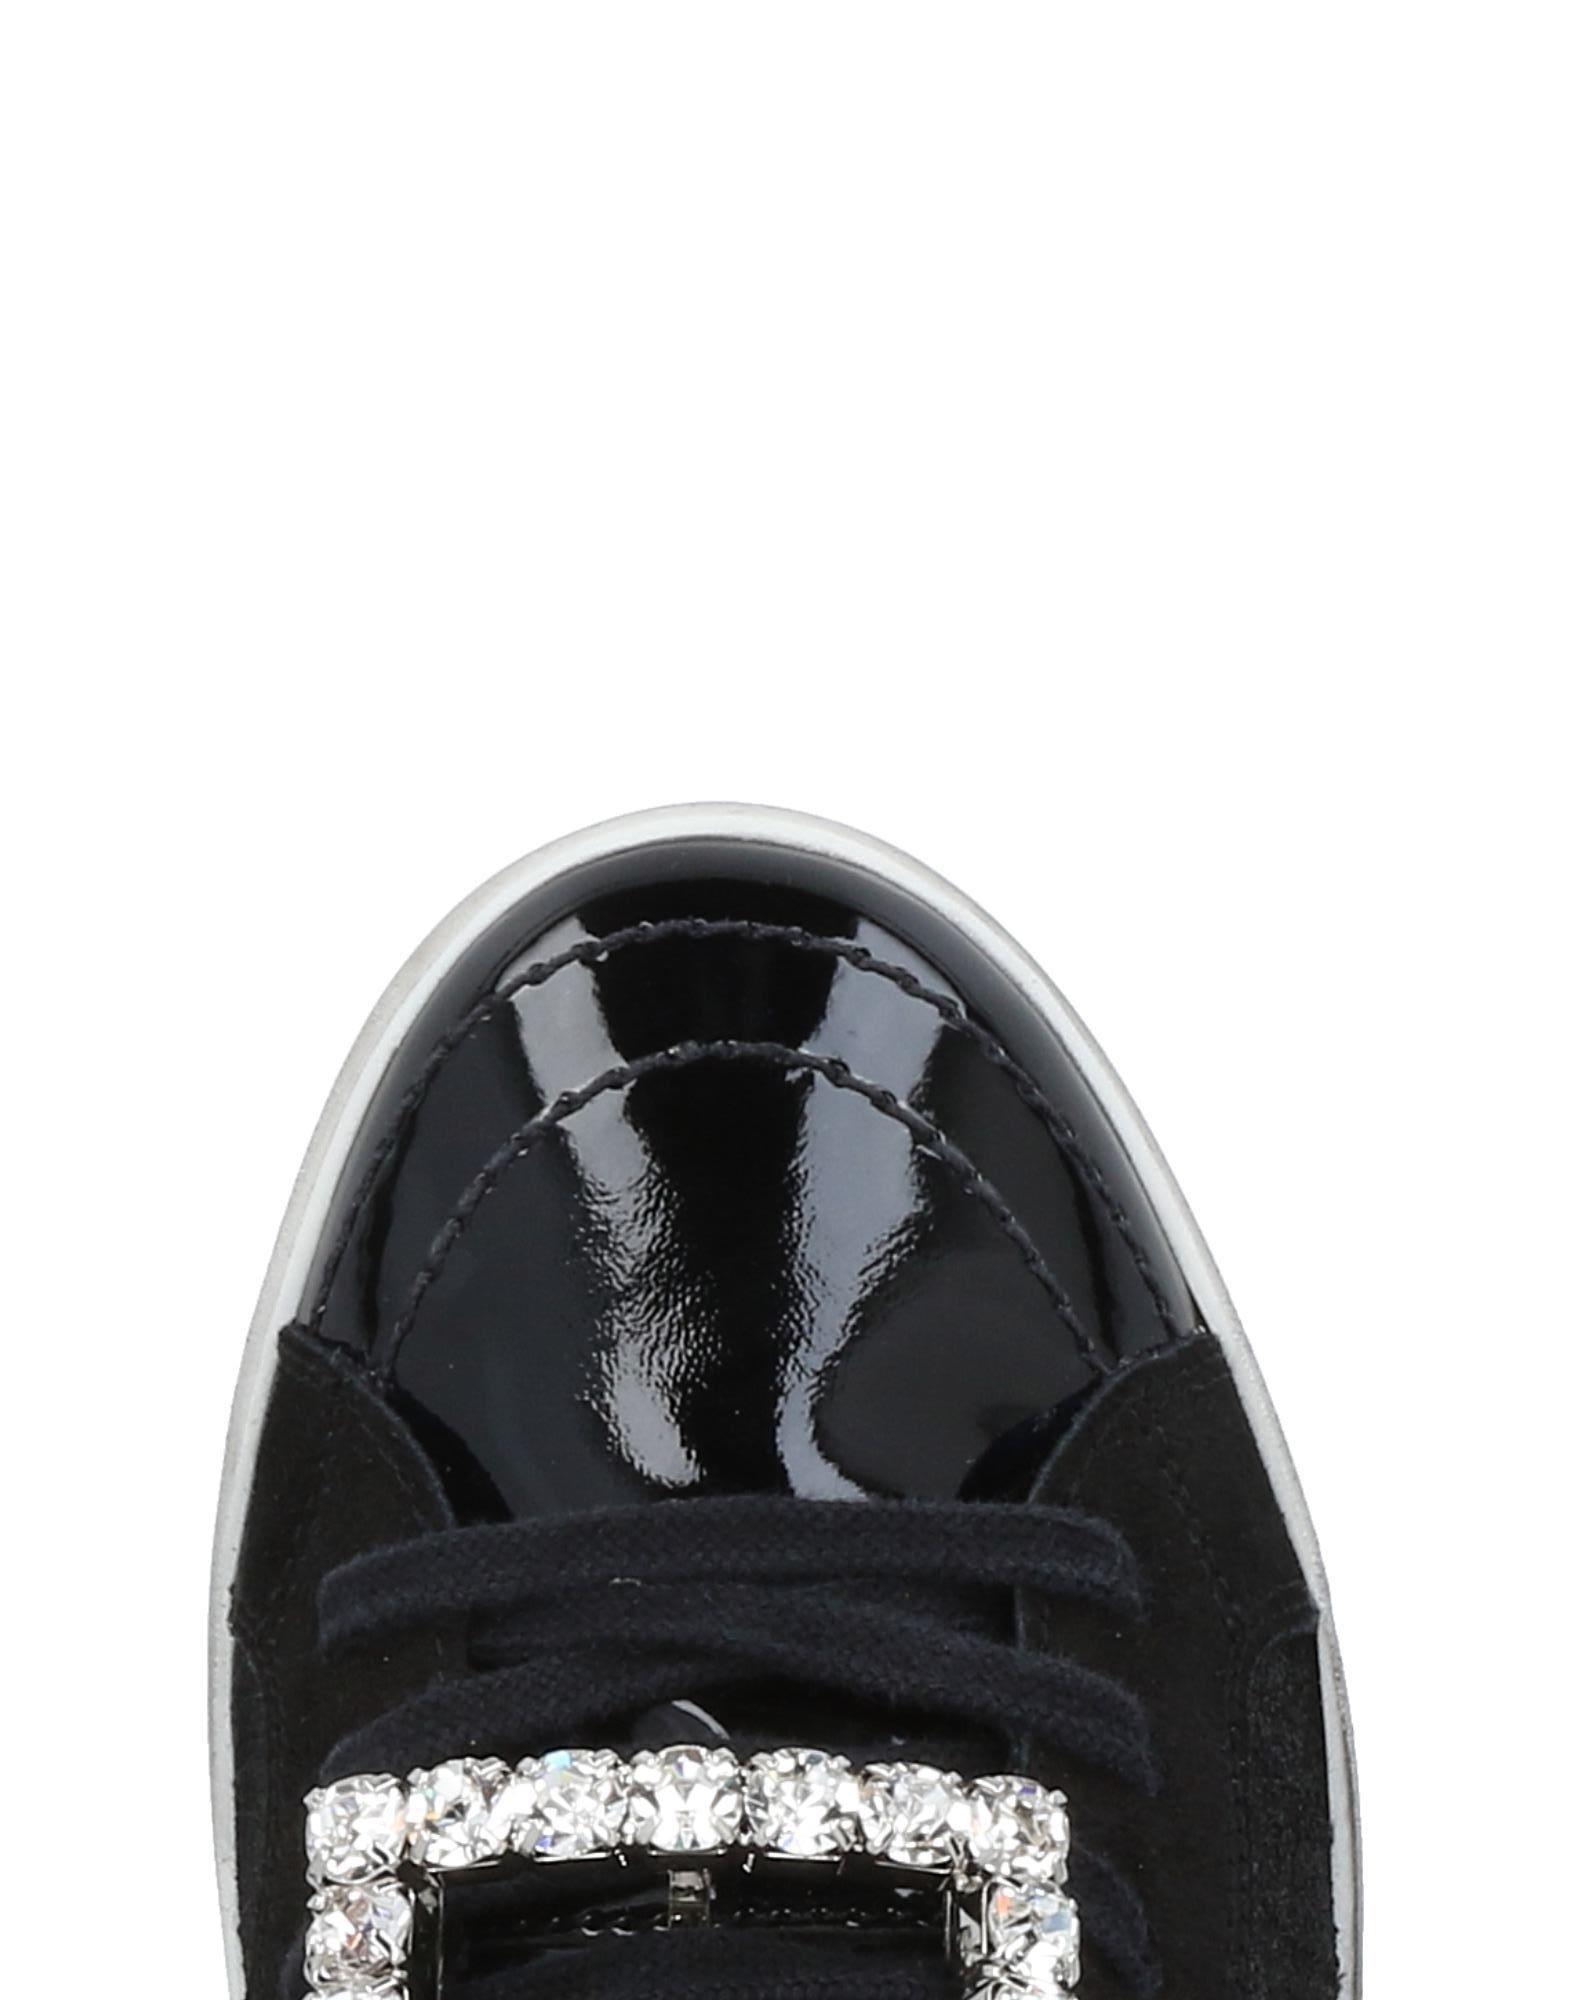 Primabase Sneakers 11486420IH Damen  11486420IH Sneakers Heiße Schuhe e3c9e3